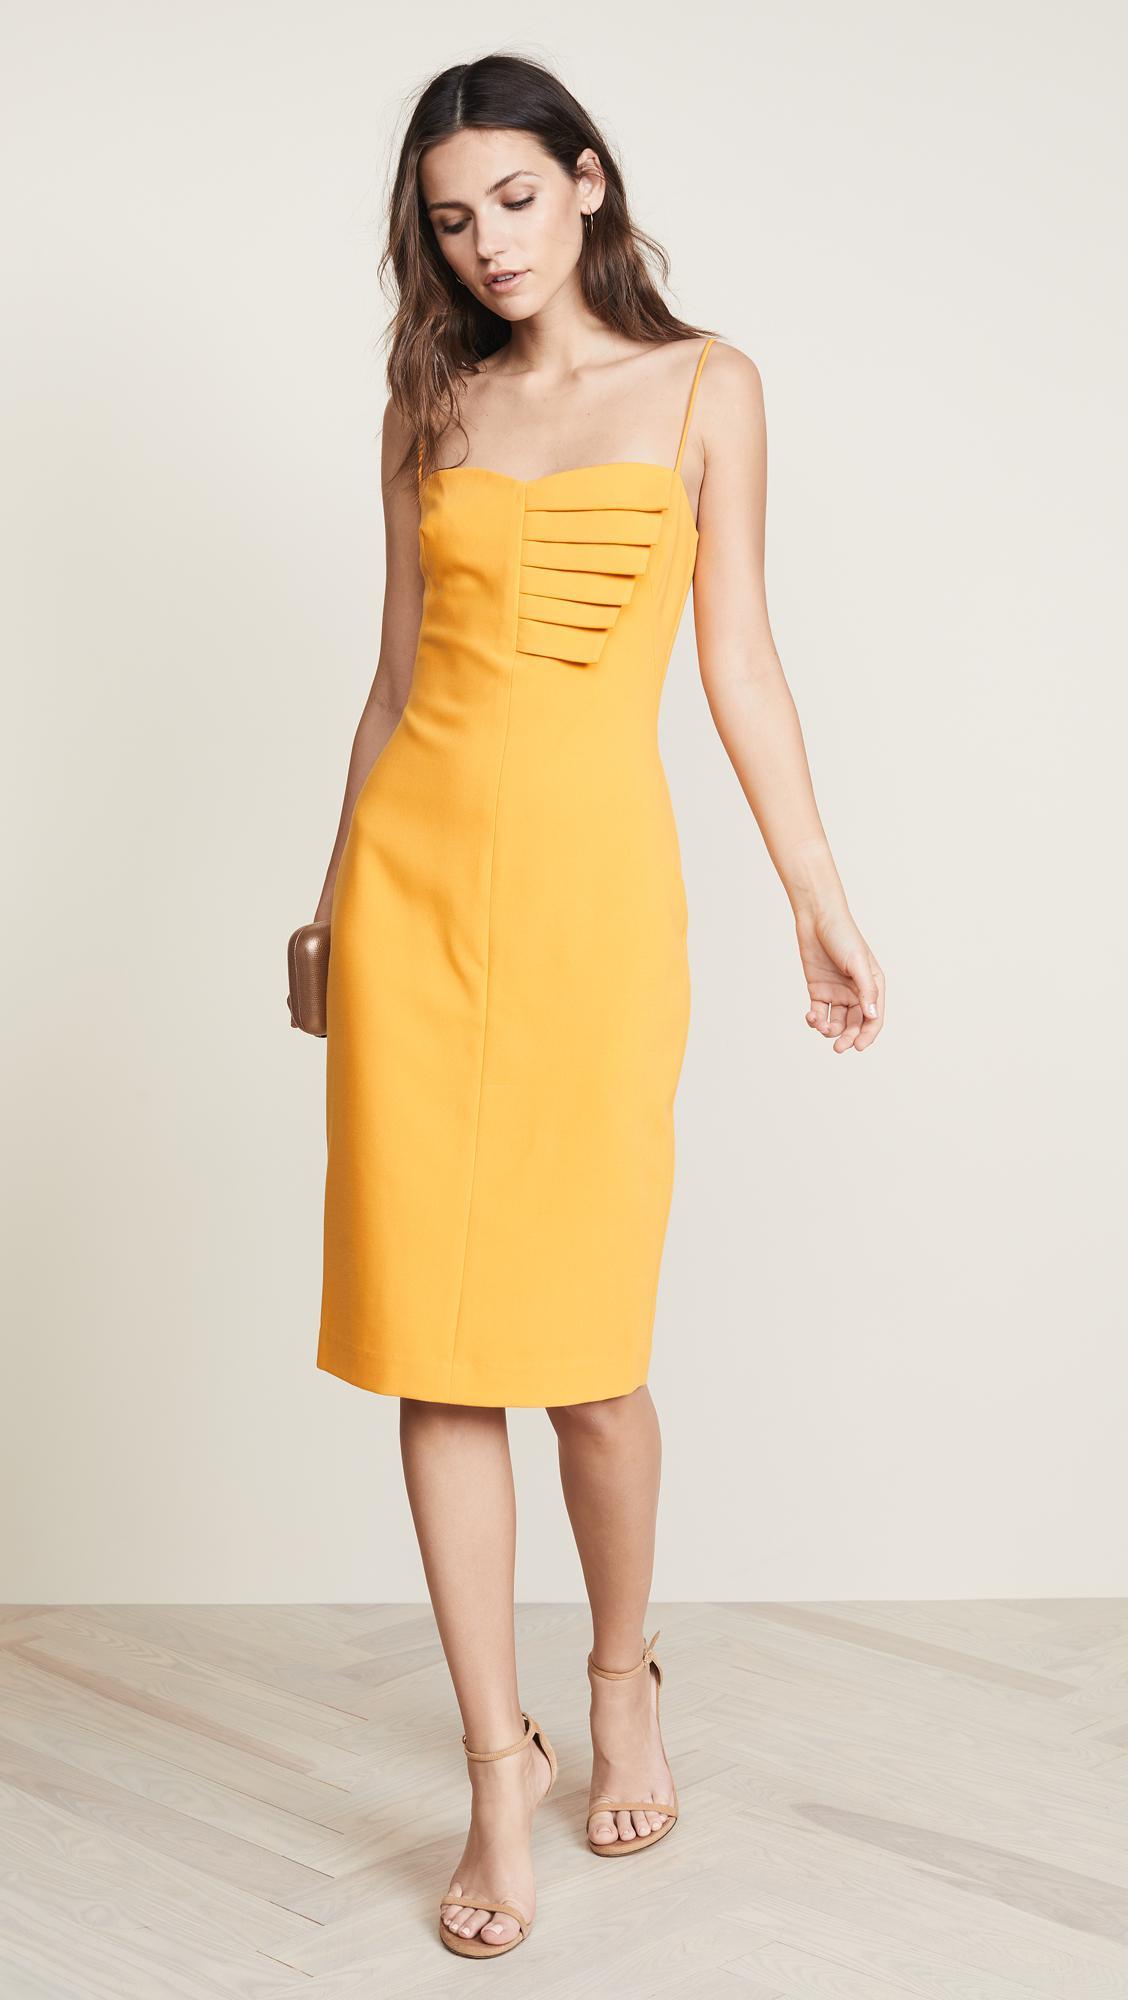 Black Halo Akeno Sheath Dress in Yellow - Lyst